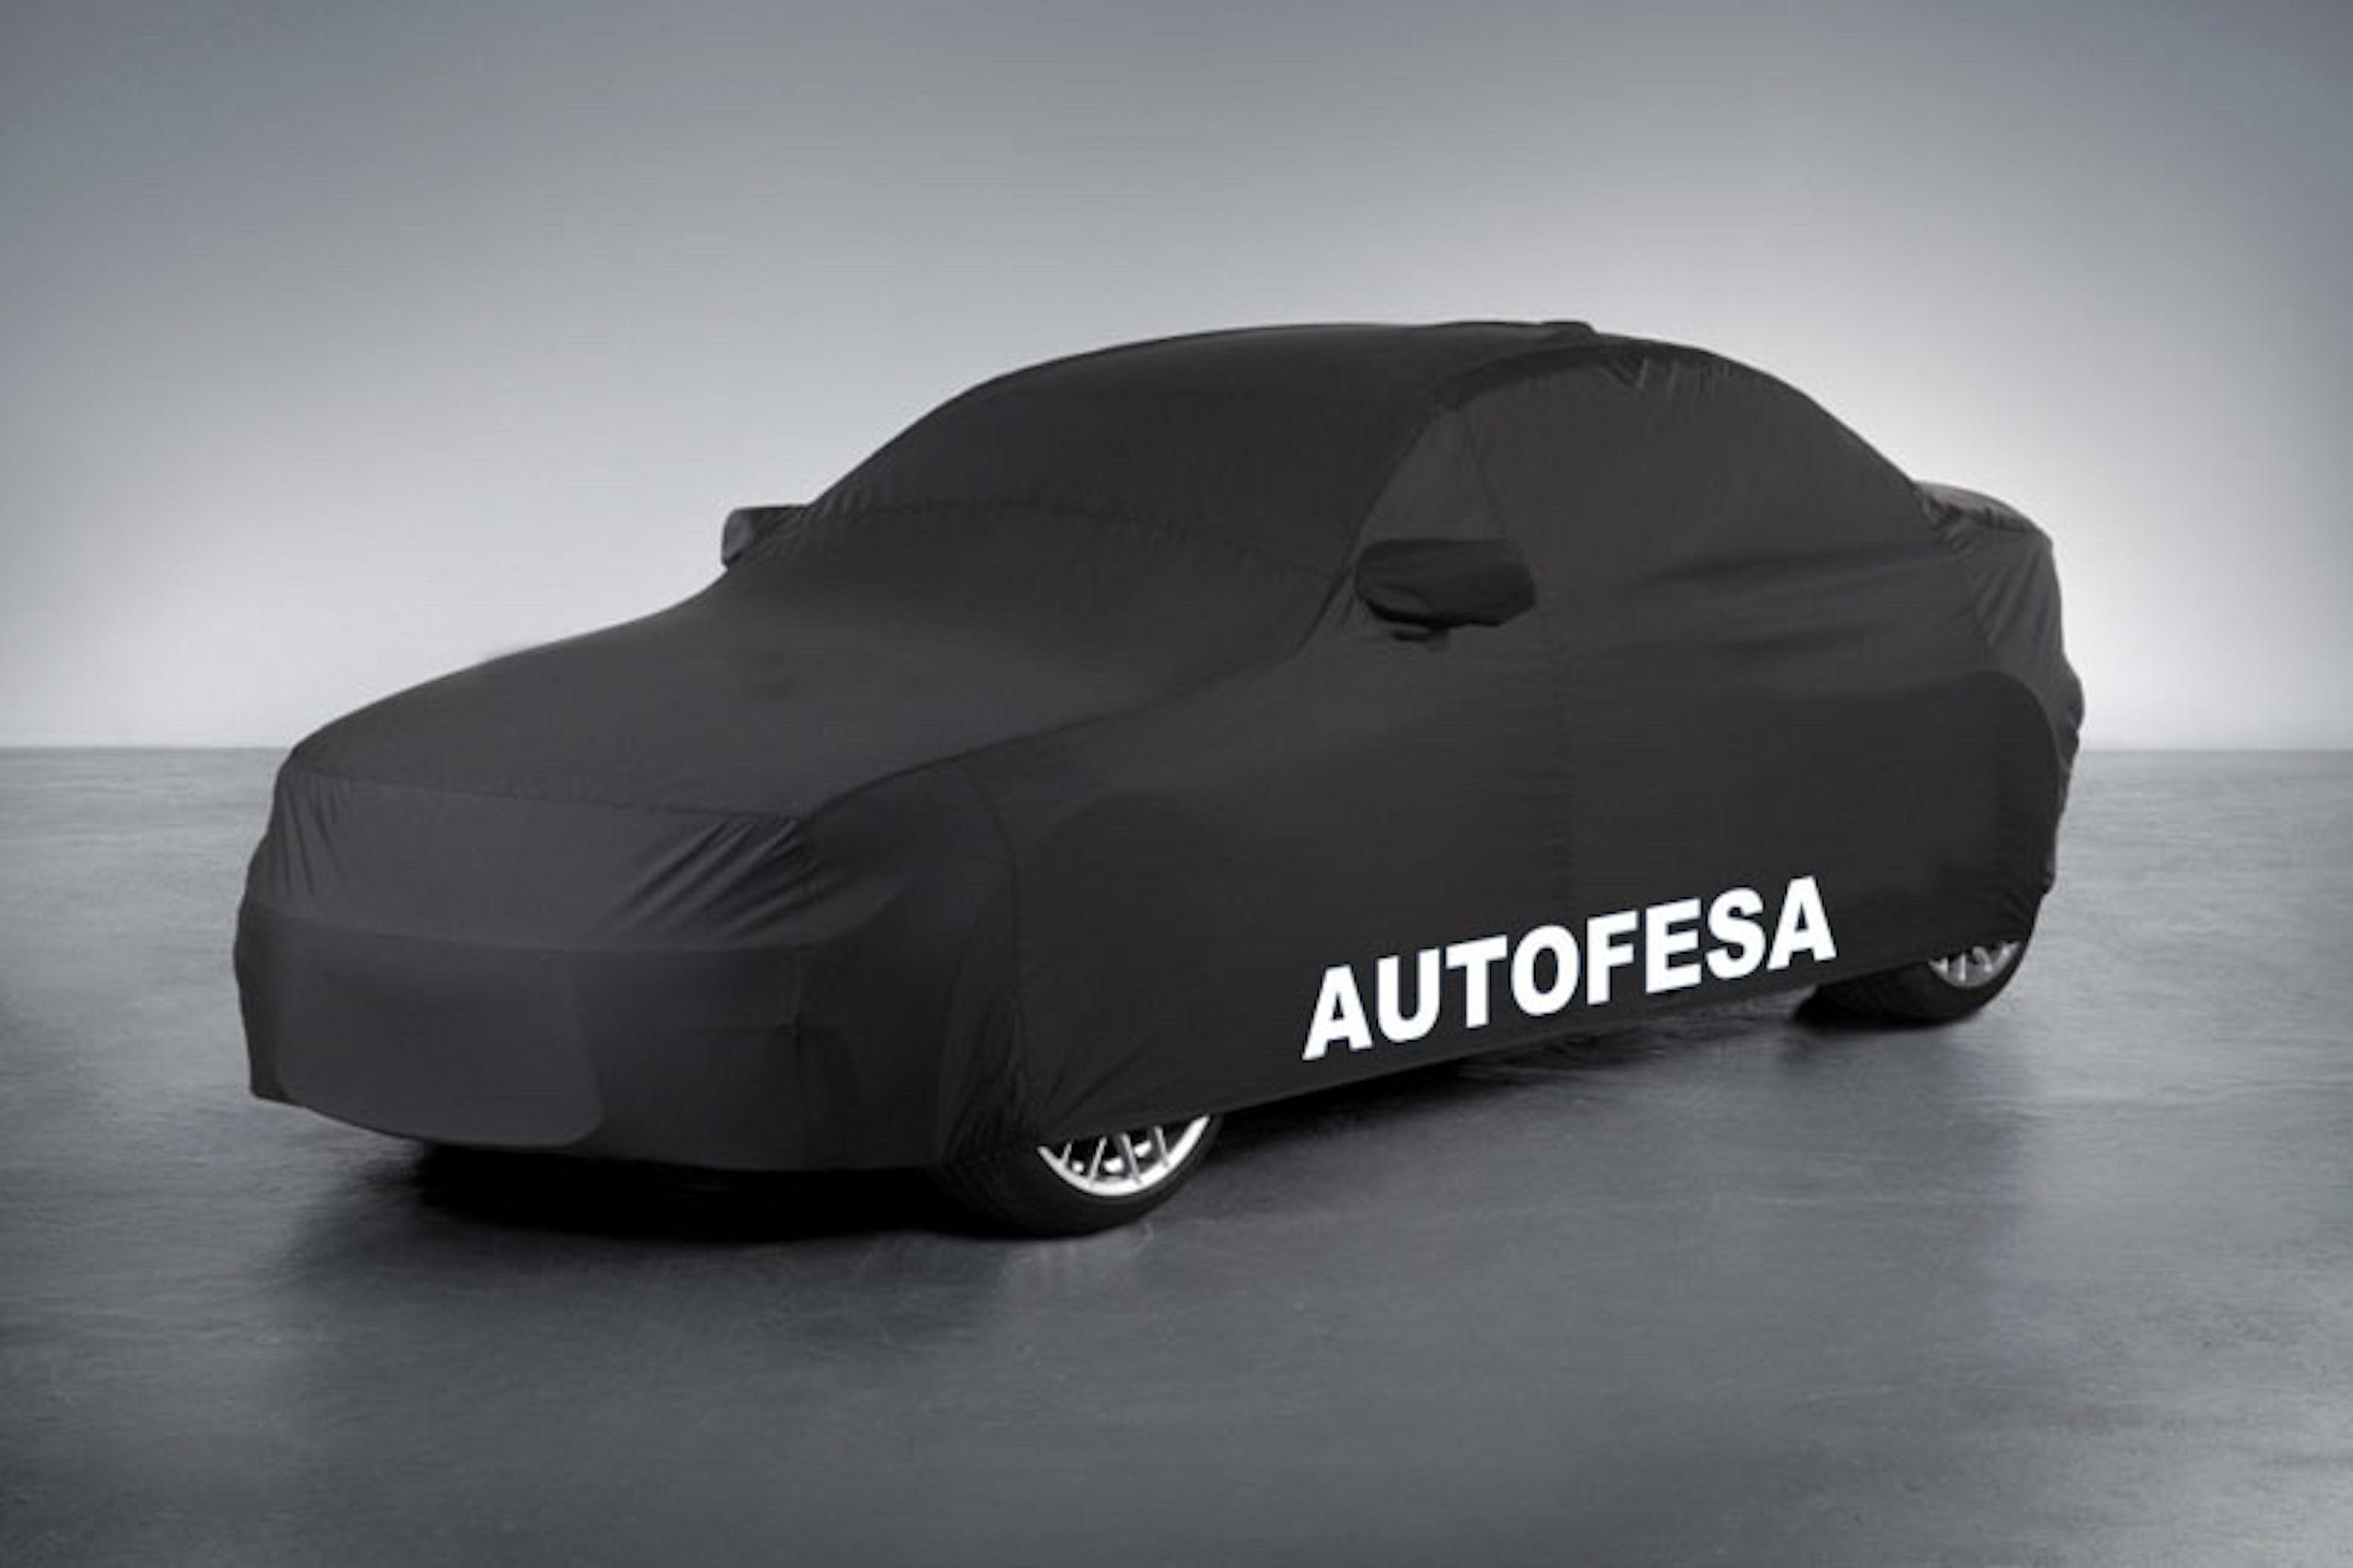 Audi A1 Sportback 1.6 TDI 115cv Adrenalin S-line 5p